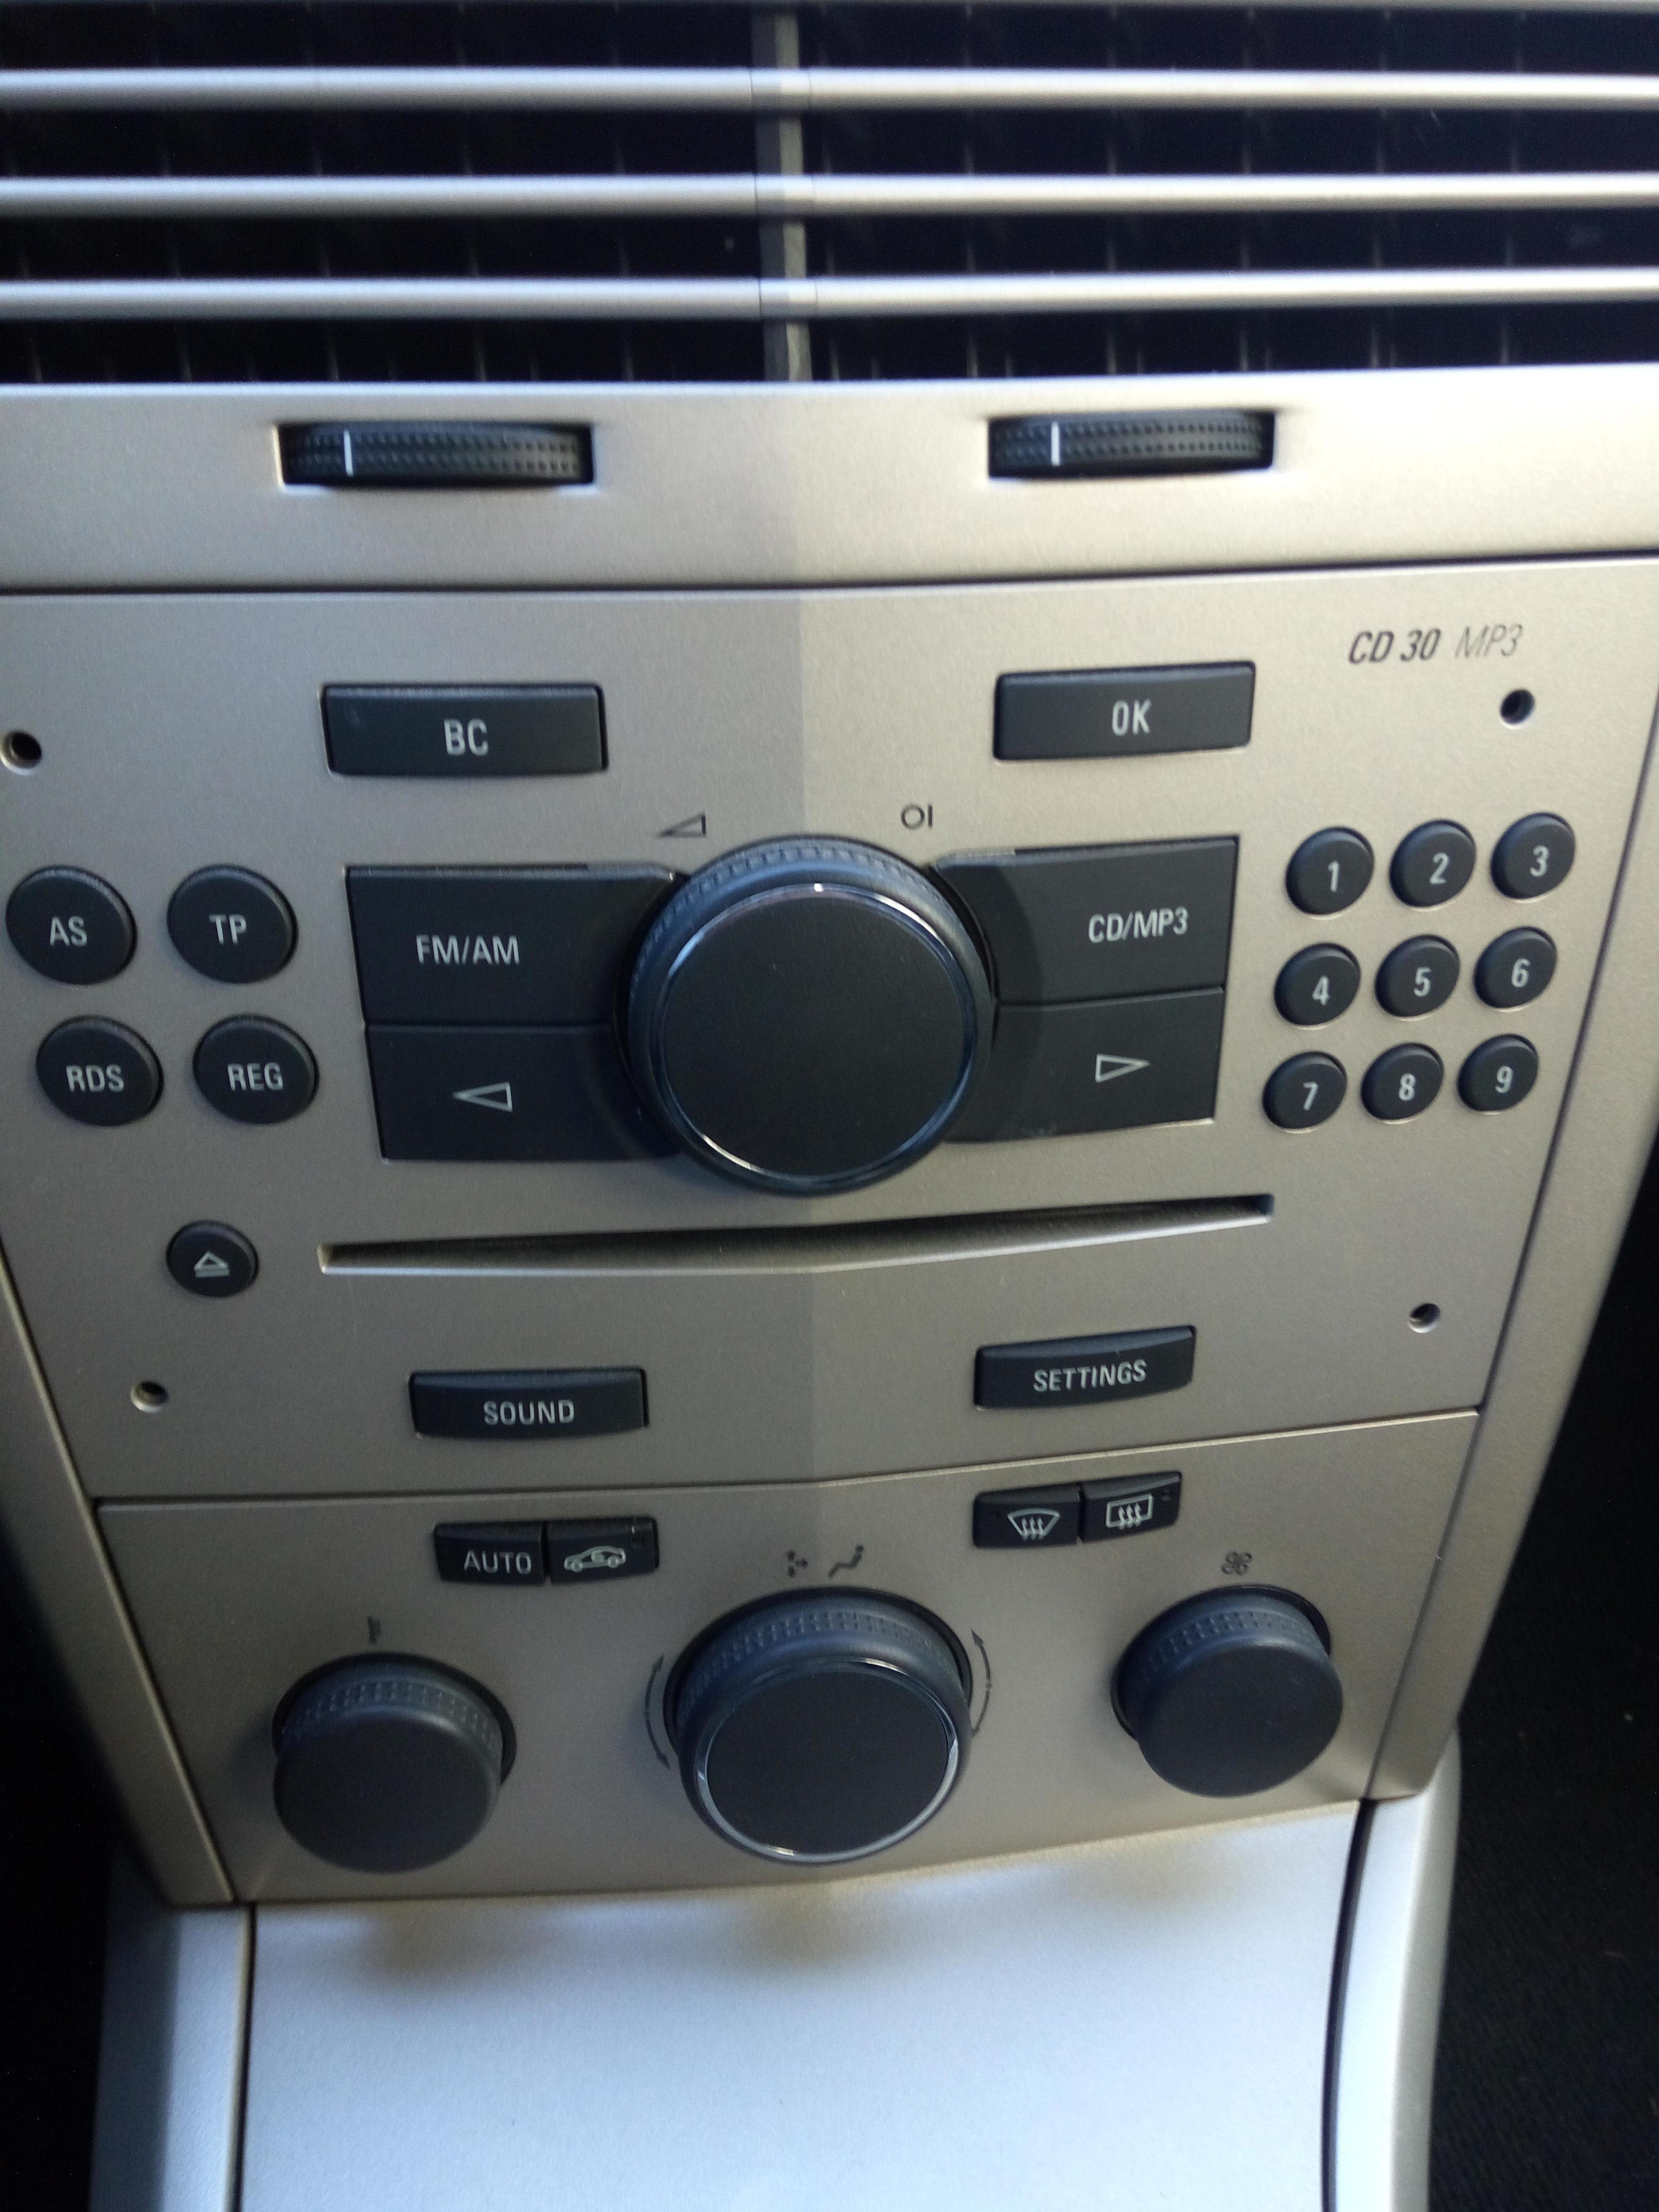 Problema Aire Acondicionado Opel Astra G 2003 (Posible